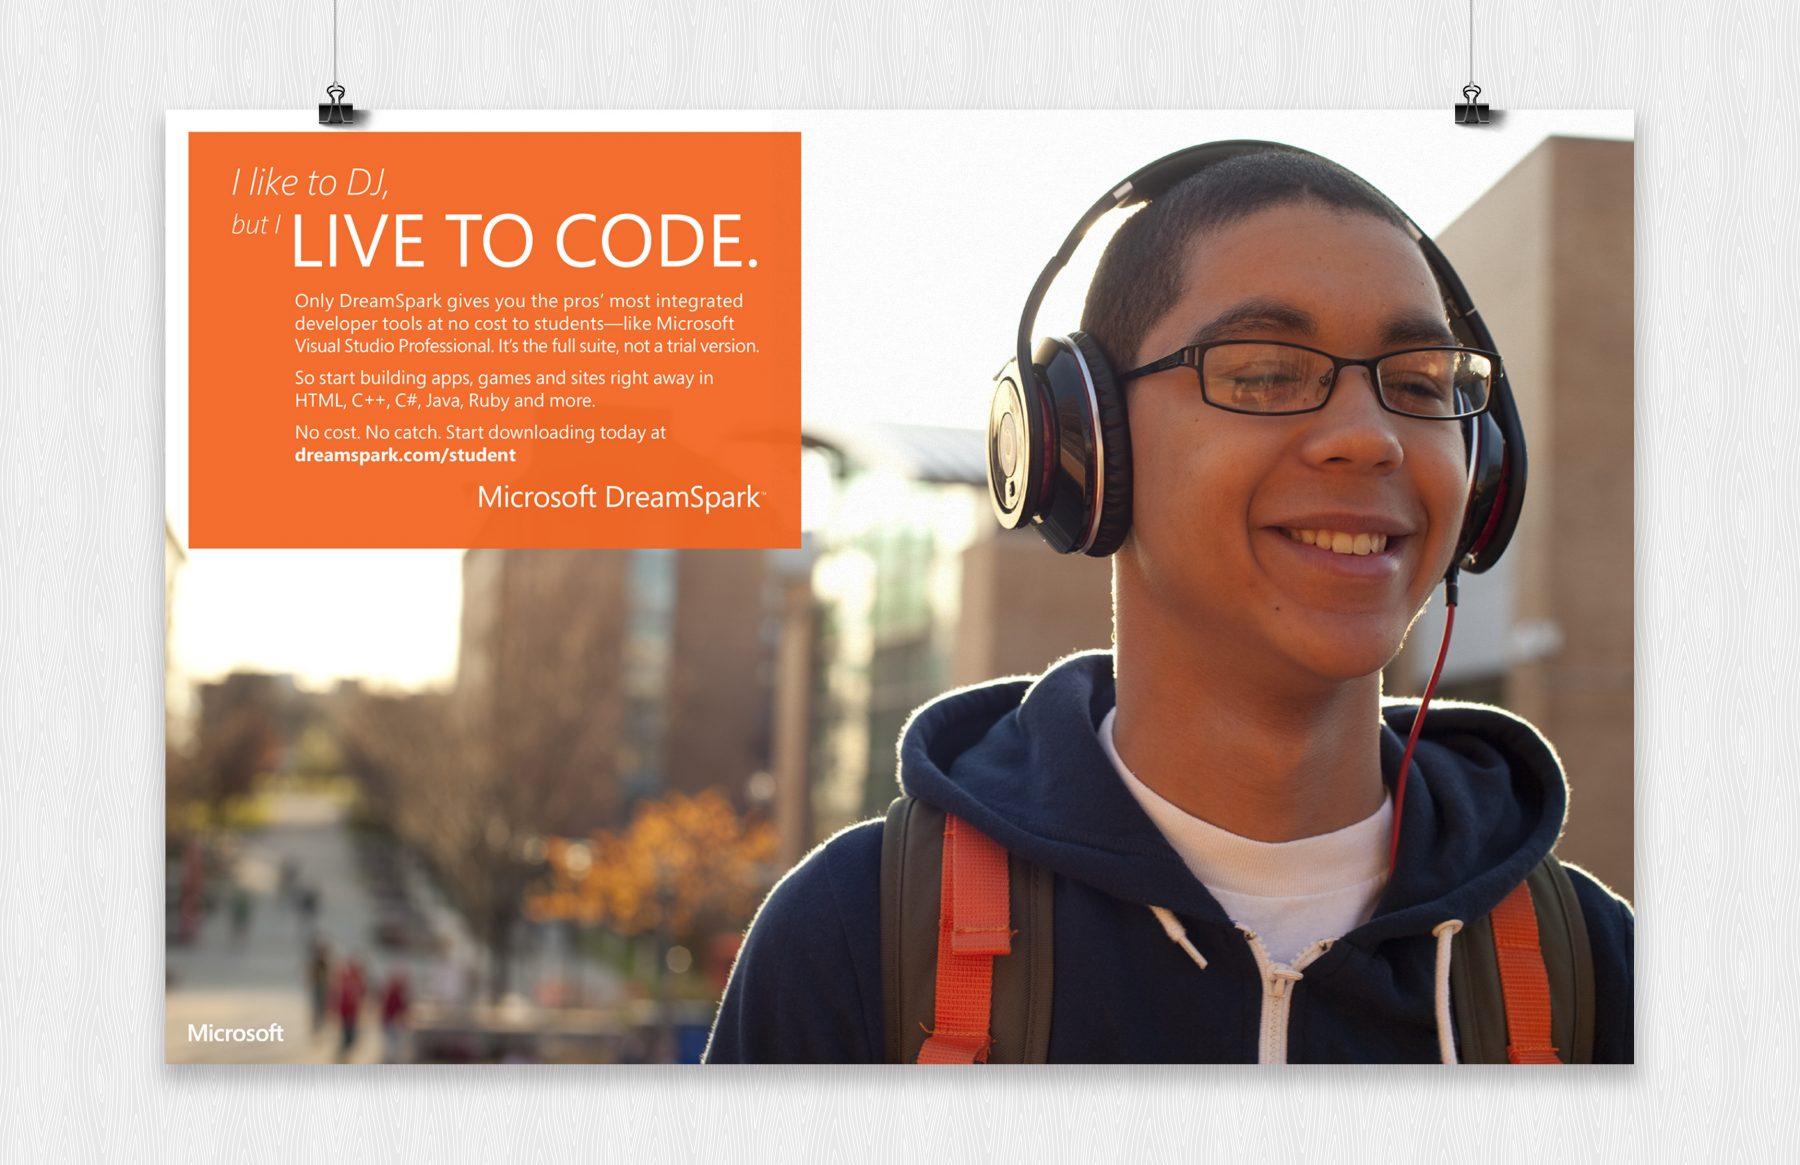 microsoft live to code poster dj